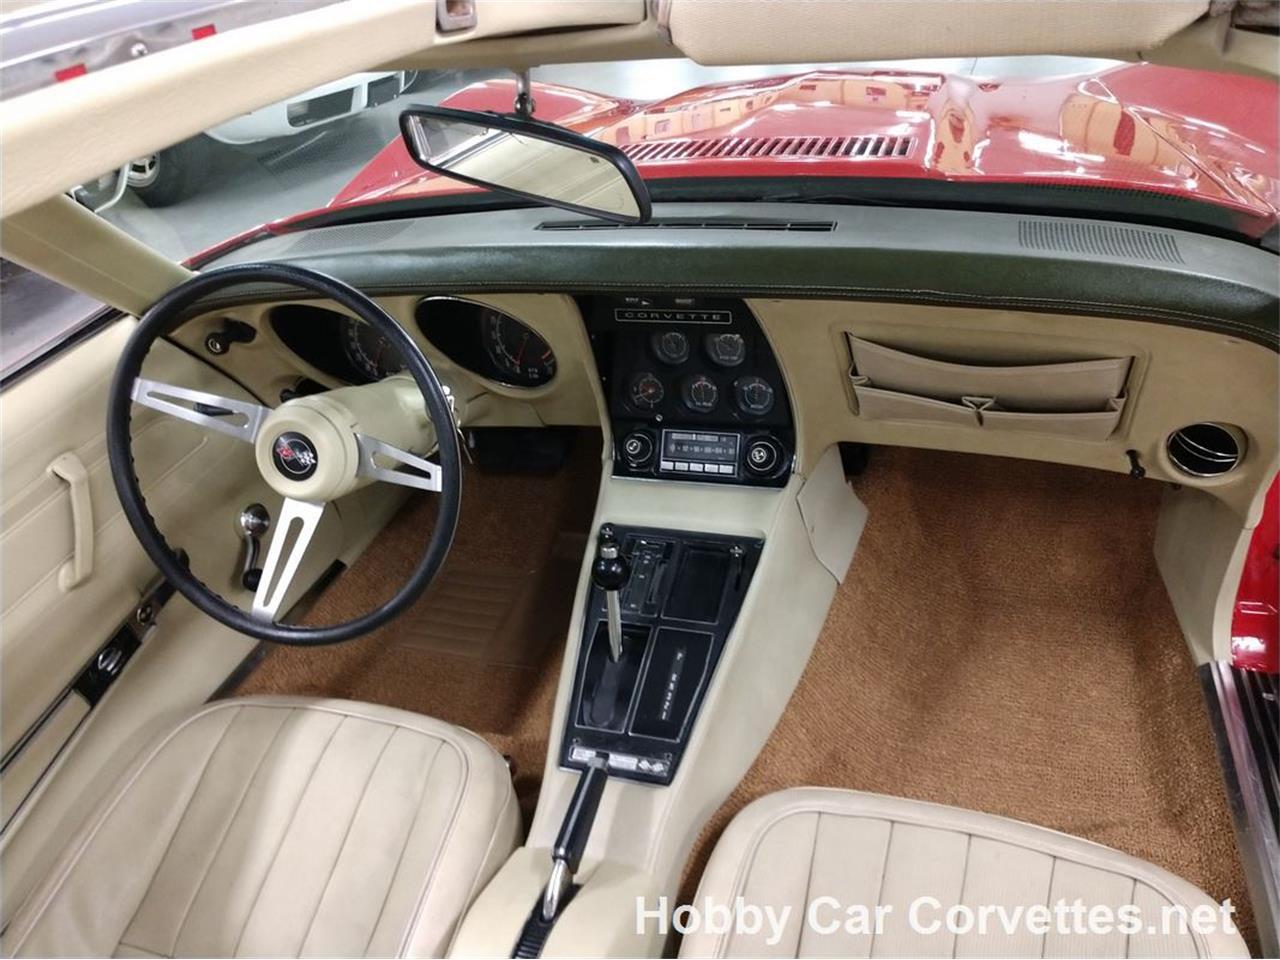 1974 Chevrolet Corvette (CC-1168454) for sale in Martinsburg, Pennsylvania